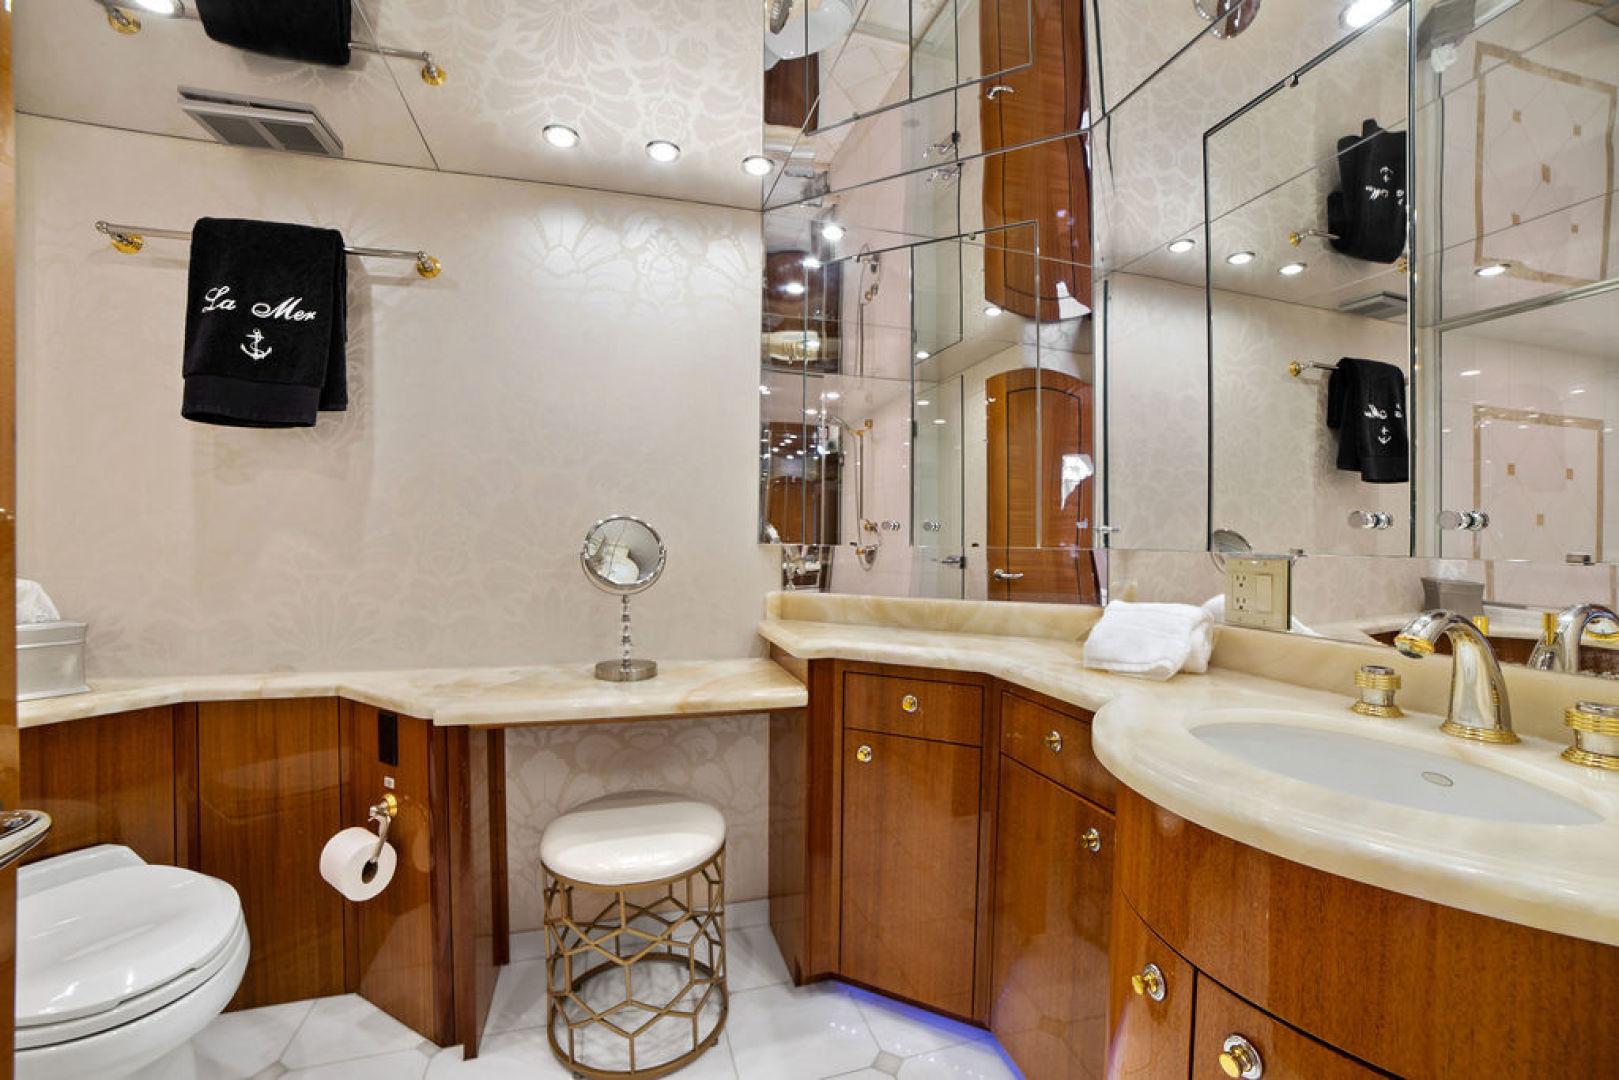 Hatteras-Enclosed Flybridge 2005-LA MER Fort Lauderdale-Florida-United States-Master Bath-1510622 | Thumbnail